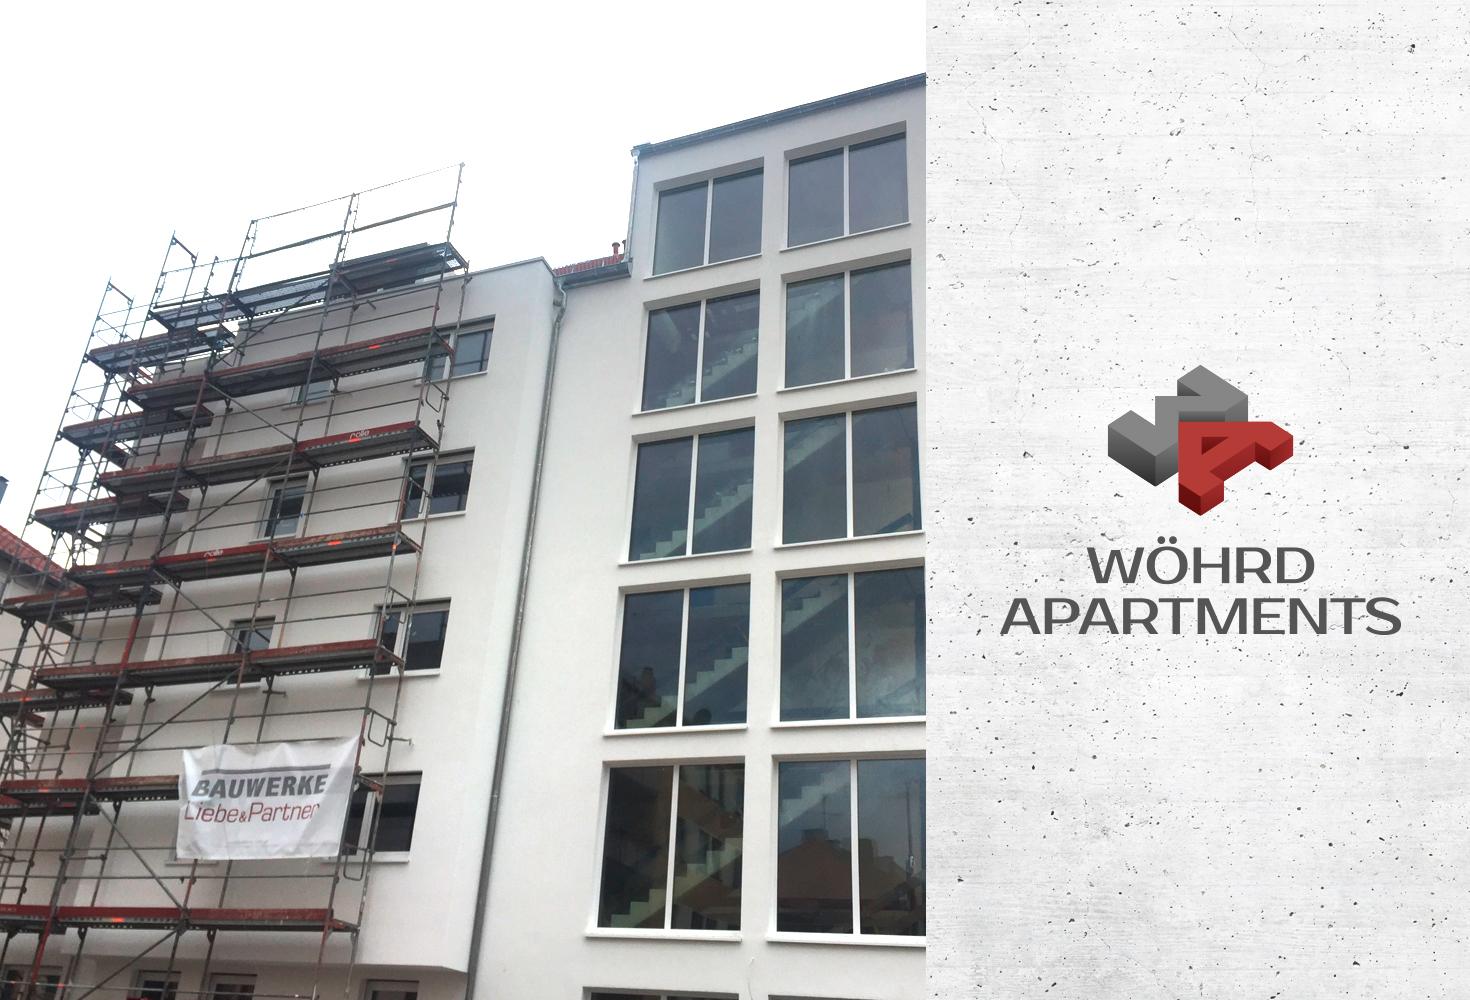 Wöhrd Apartments – Baufortschritt in Nürnberg |BAUWERKE –Liebe & Partner